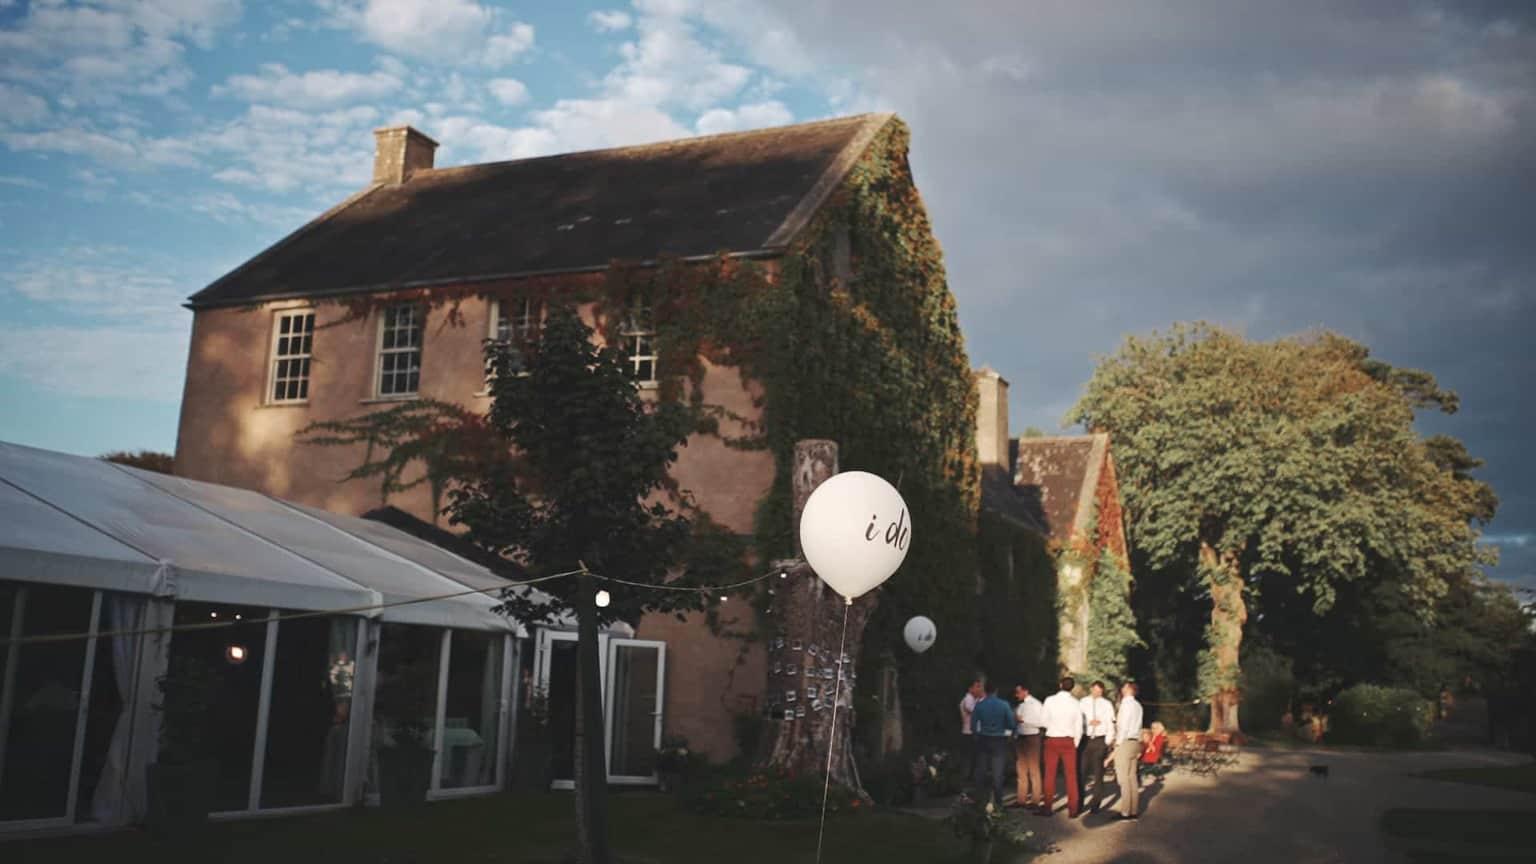 cloughjordan house outside decorations